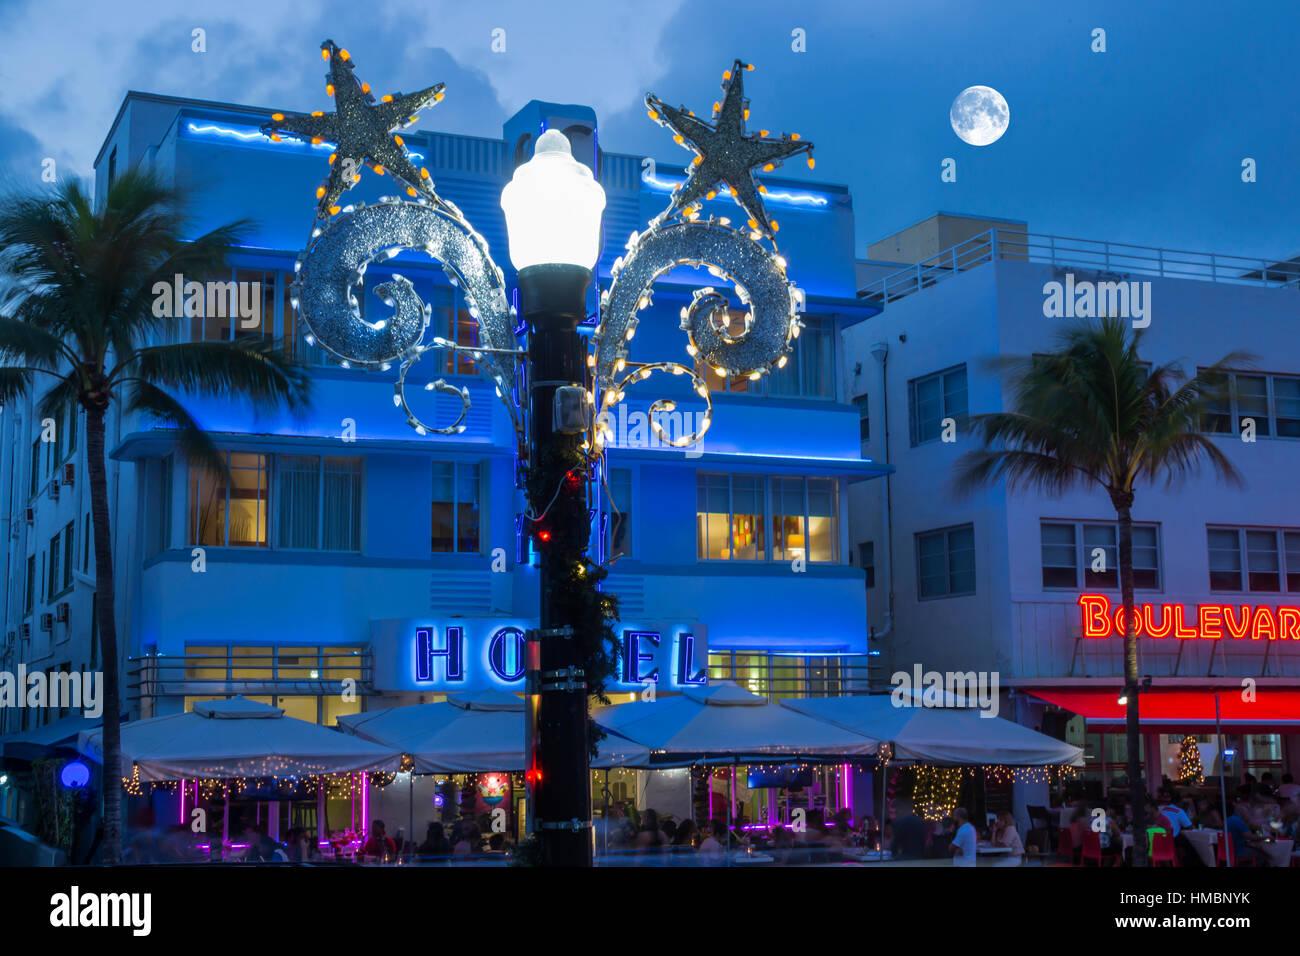 christmas decorations street lamp hotels ocean drive south beach miami beach florida usa stock image